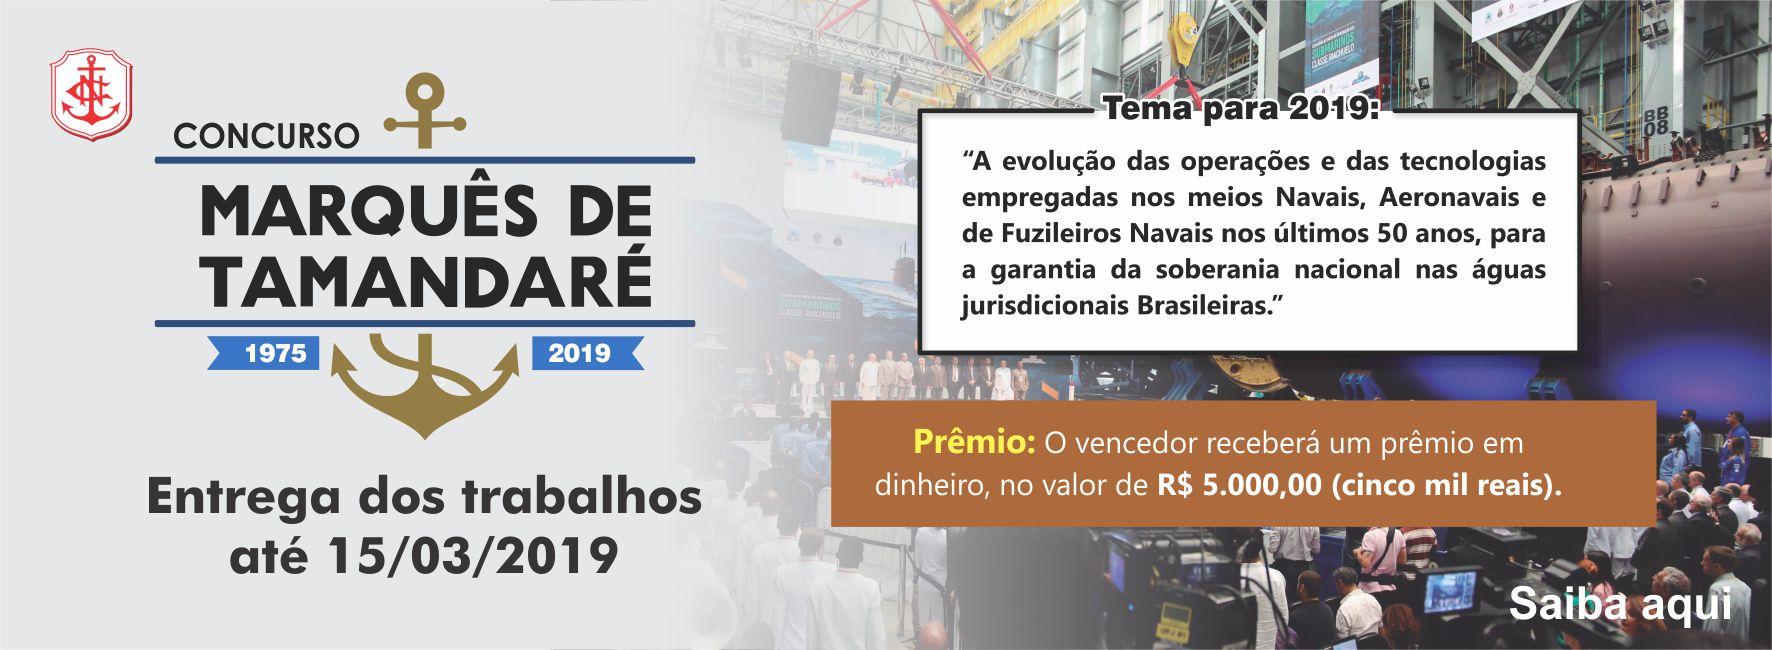 https://www.clubenaval.org.br/novo/concurso-marqu%C3%AAs-de-tamandar%C3%A9-2019